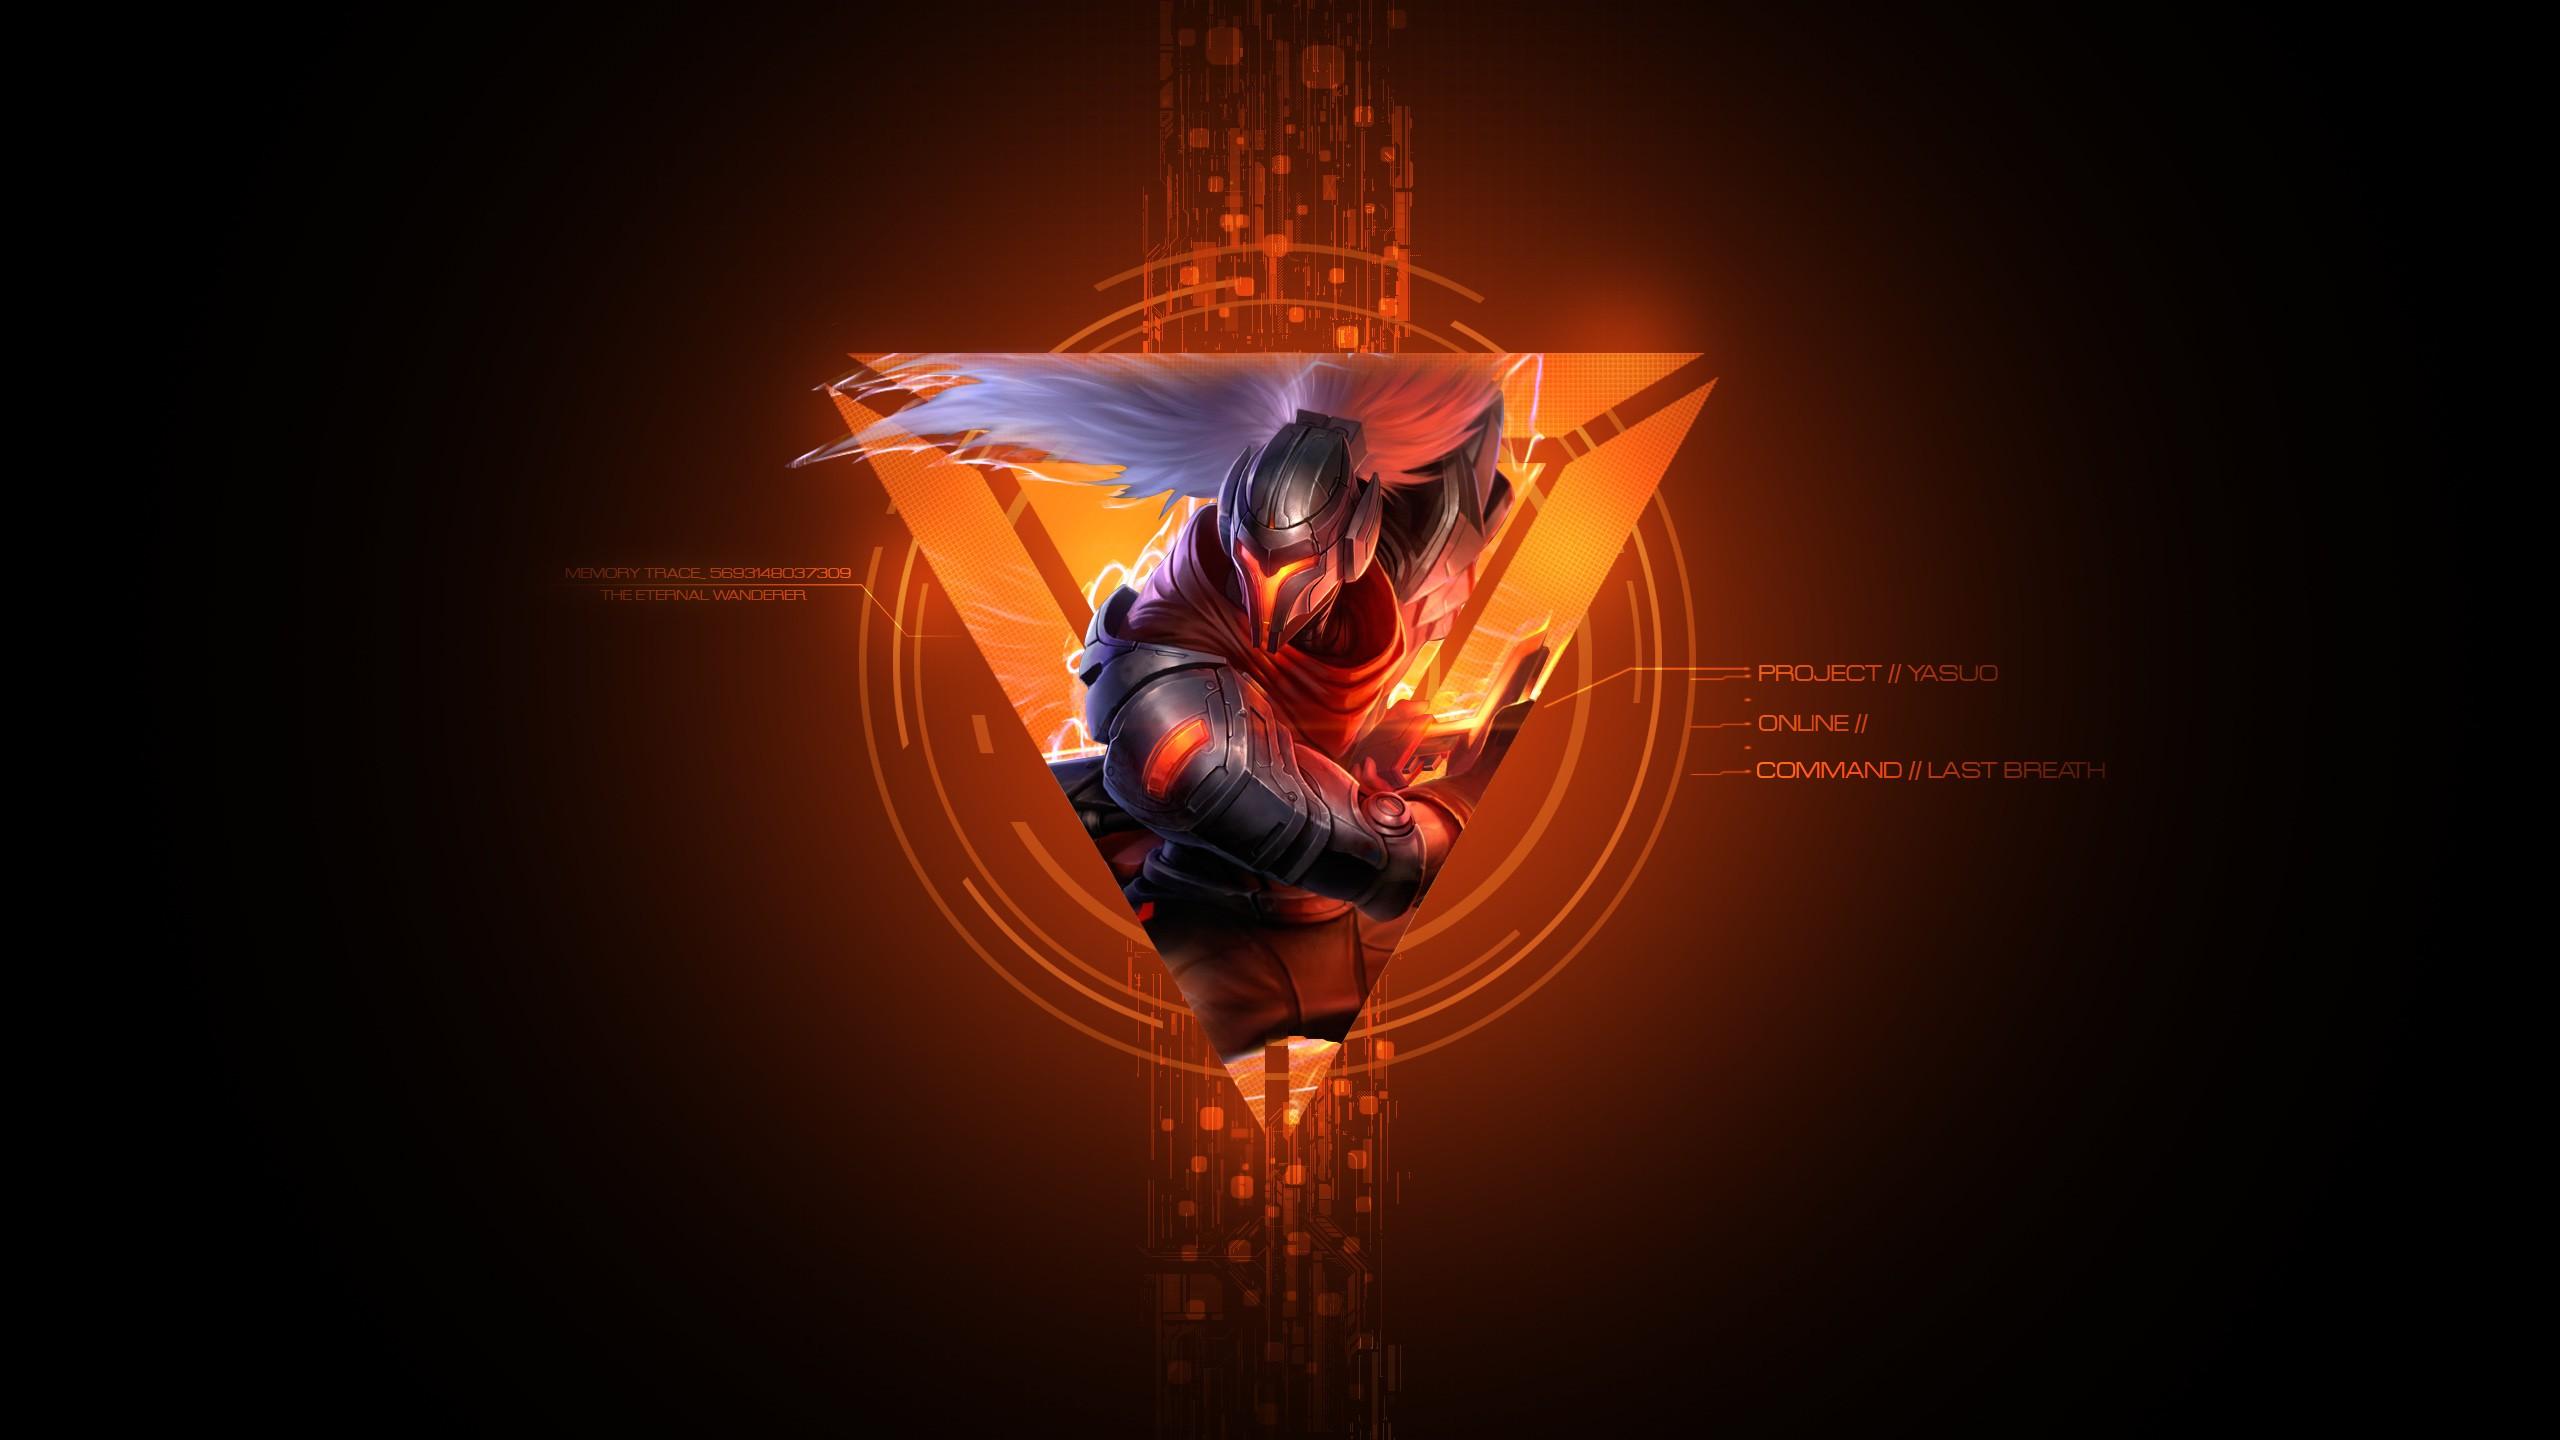 League Of Legends Project Logo 2268487 Hd Wallpaper